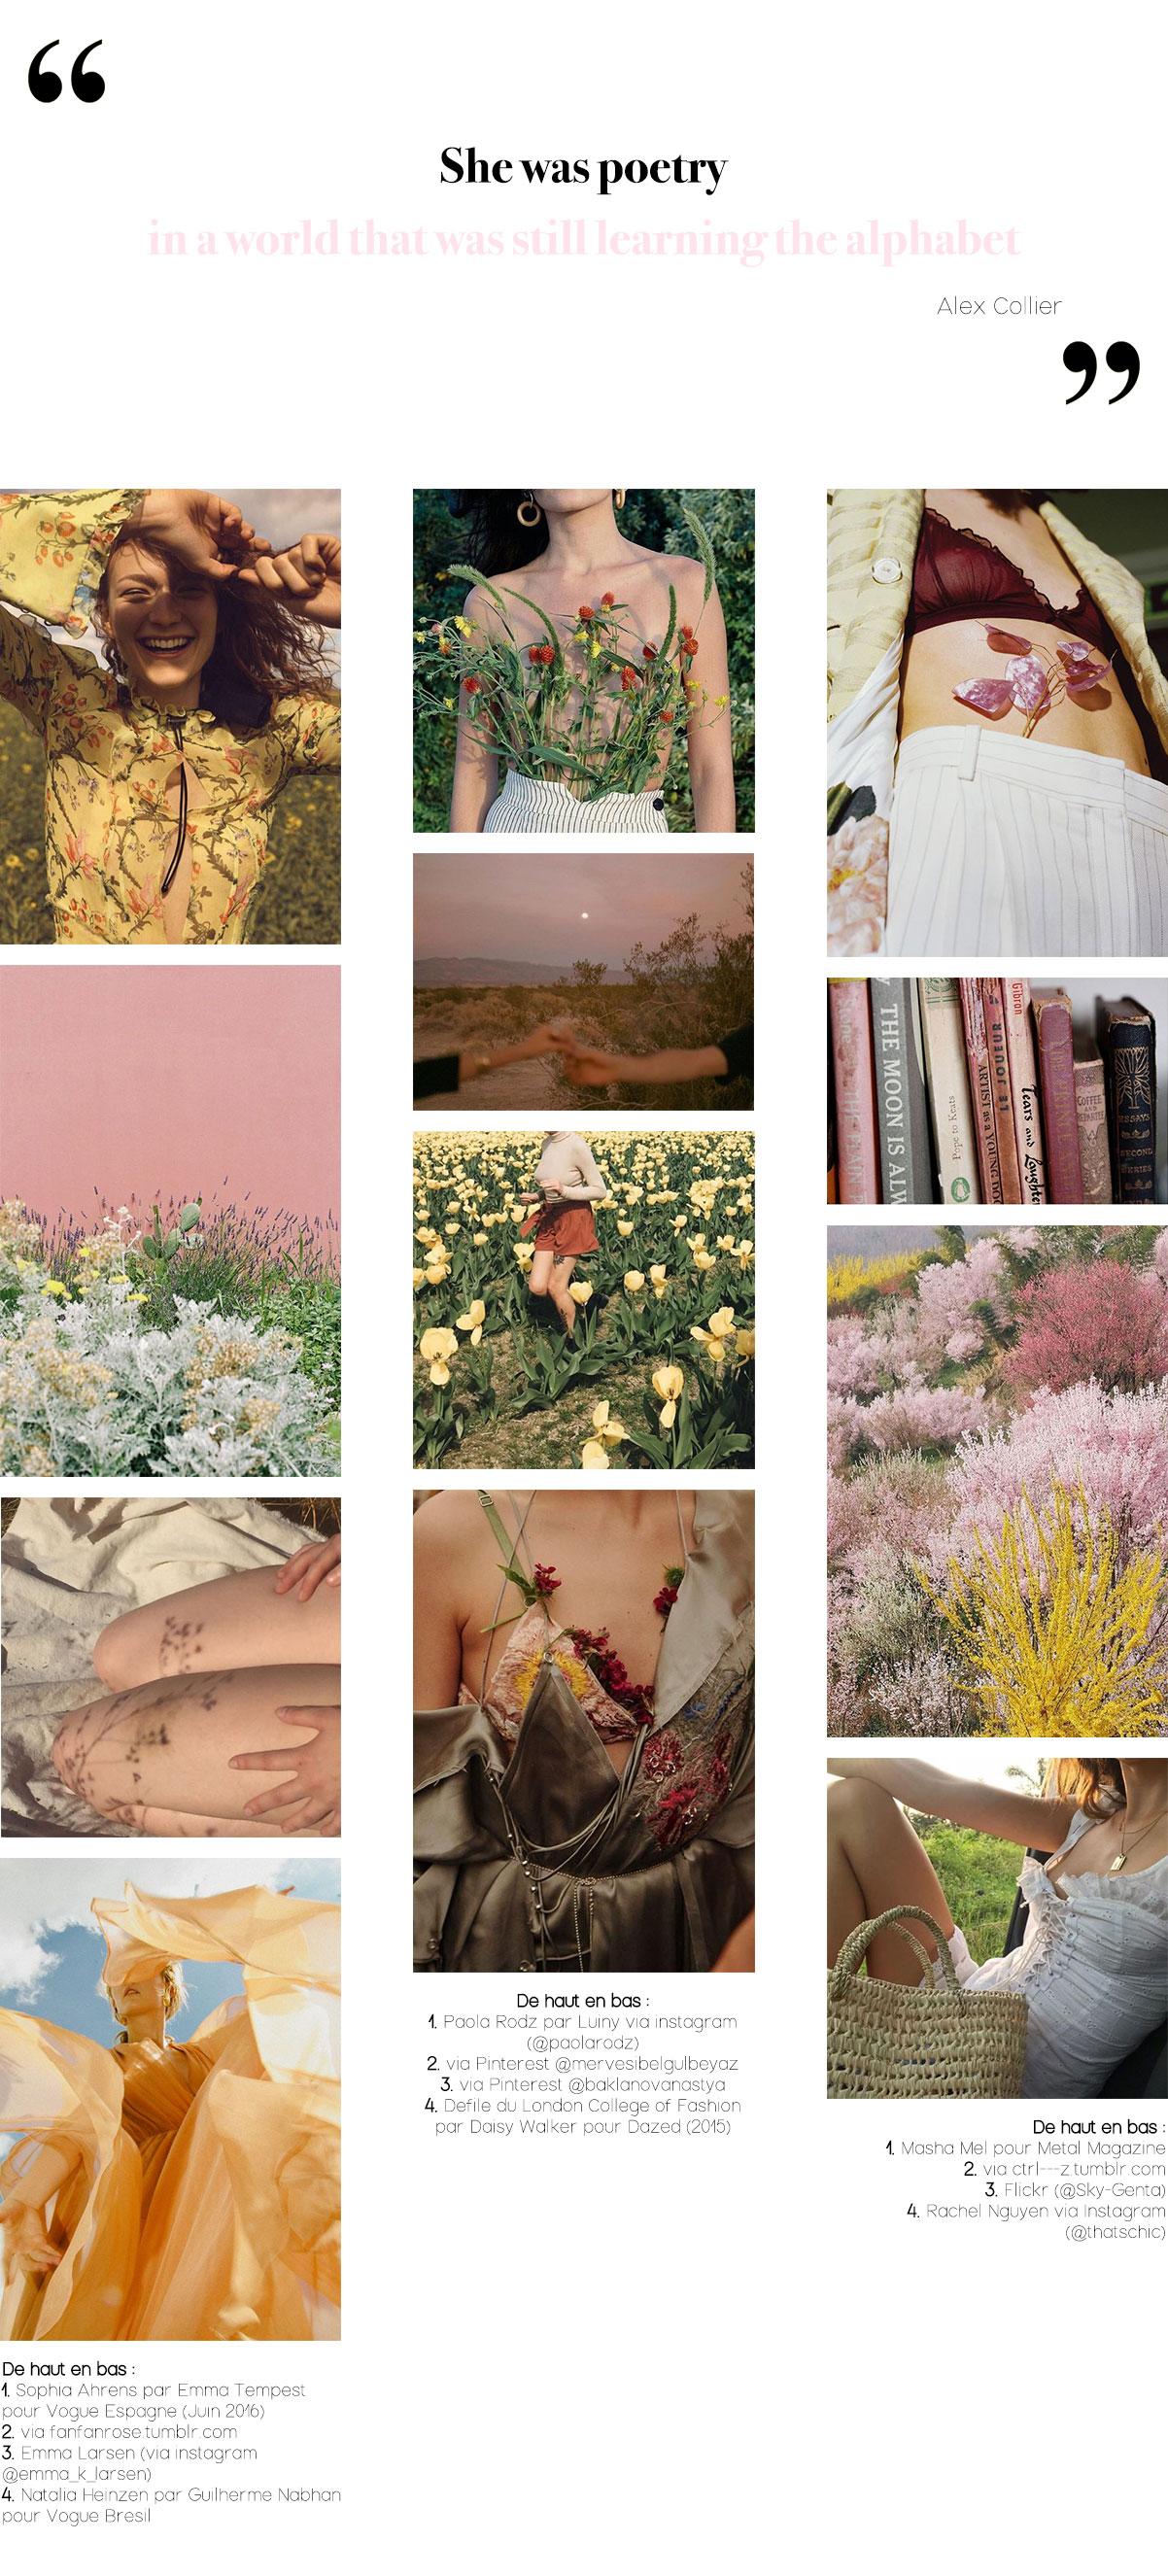 Moodboard / Inspirations Pinterest 12 : La vie de bohème